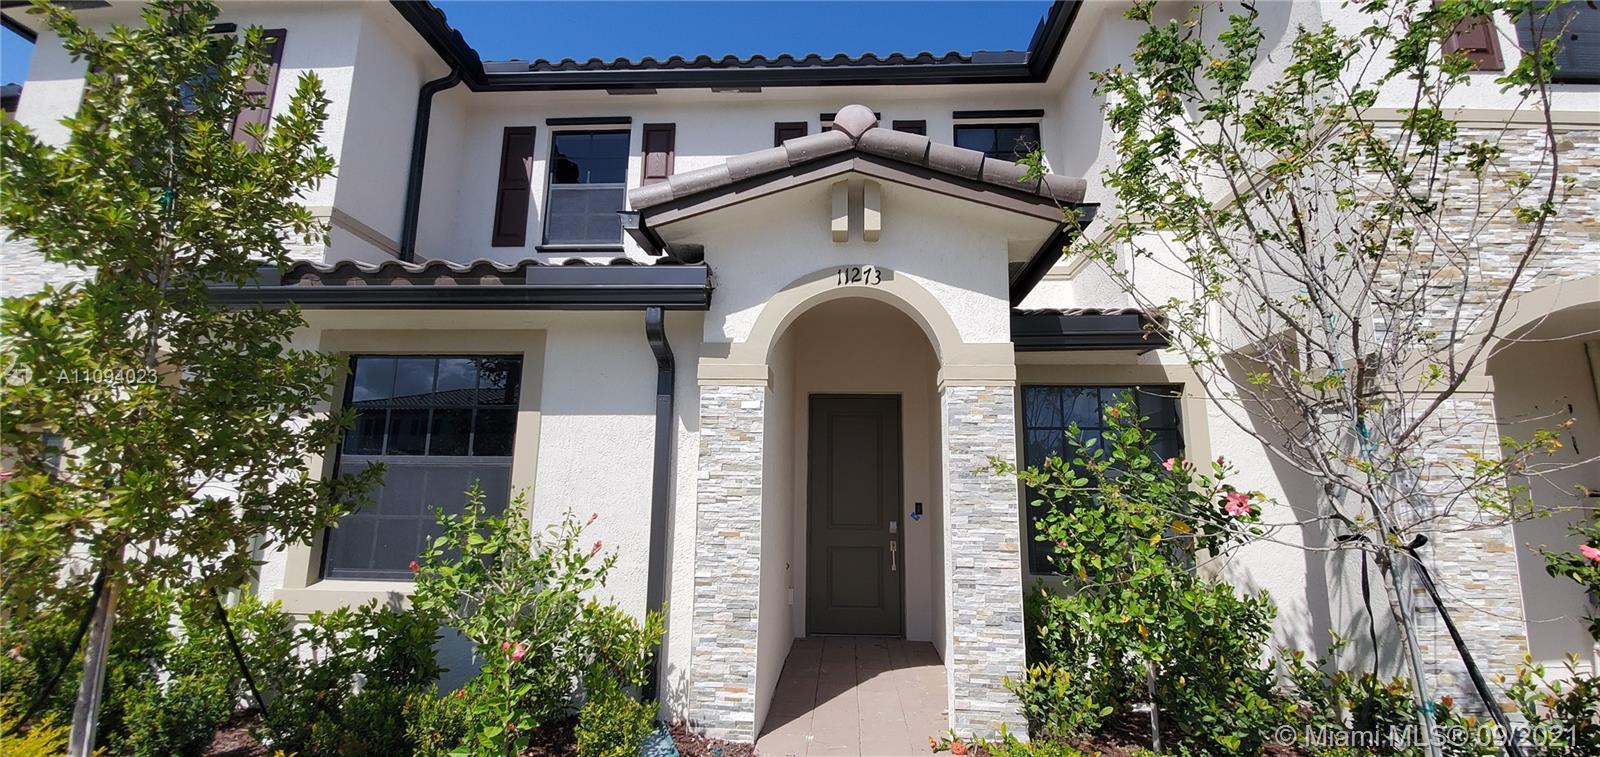 11273 Sw 249th St 11273 Property Photo